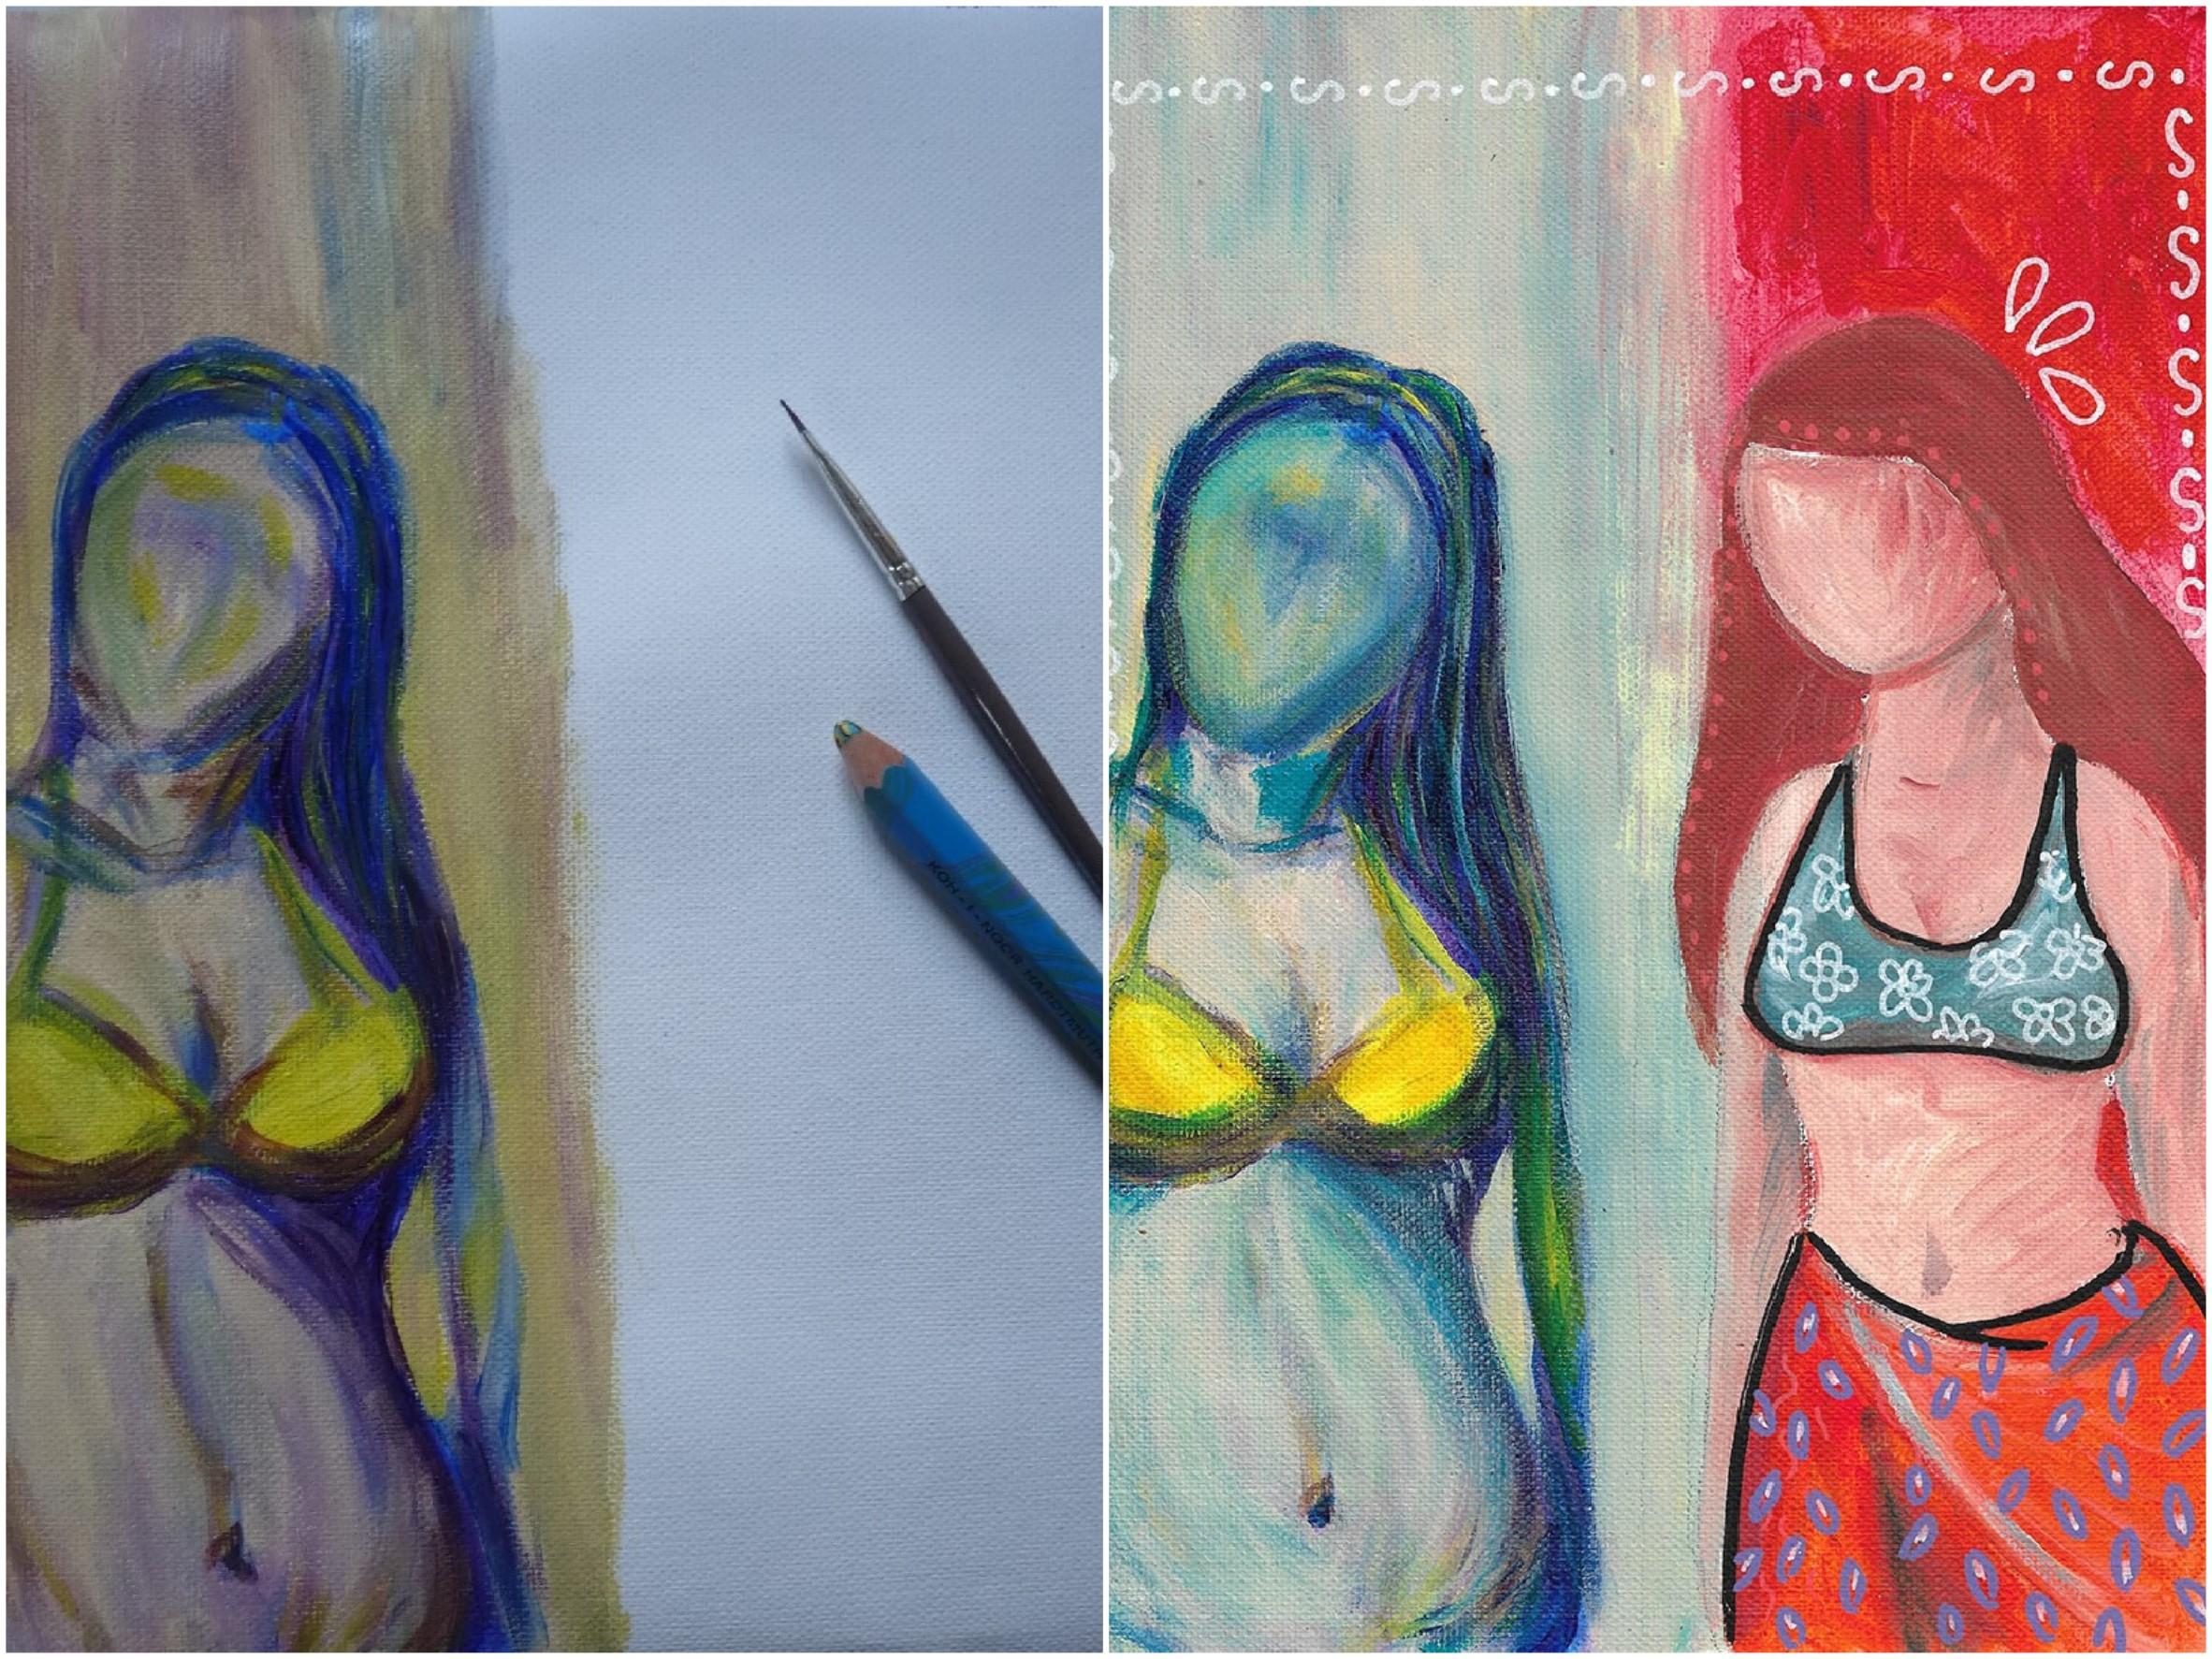 femme bikini maillot de bain peinture collective